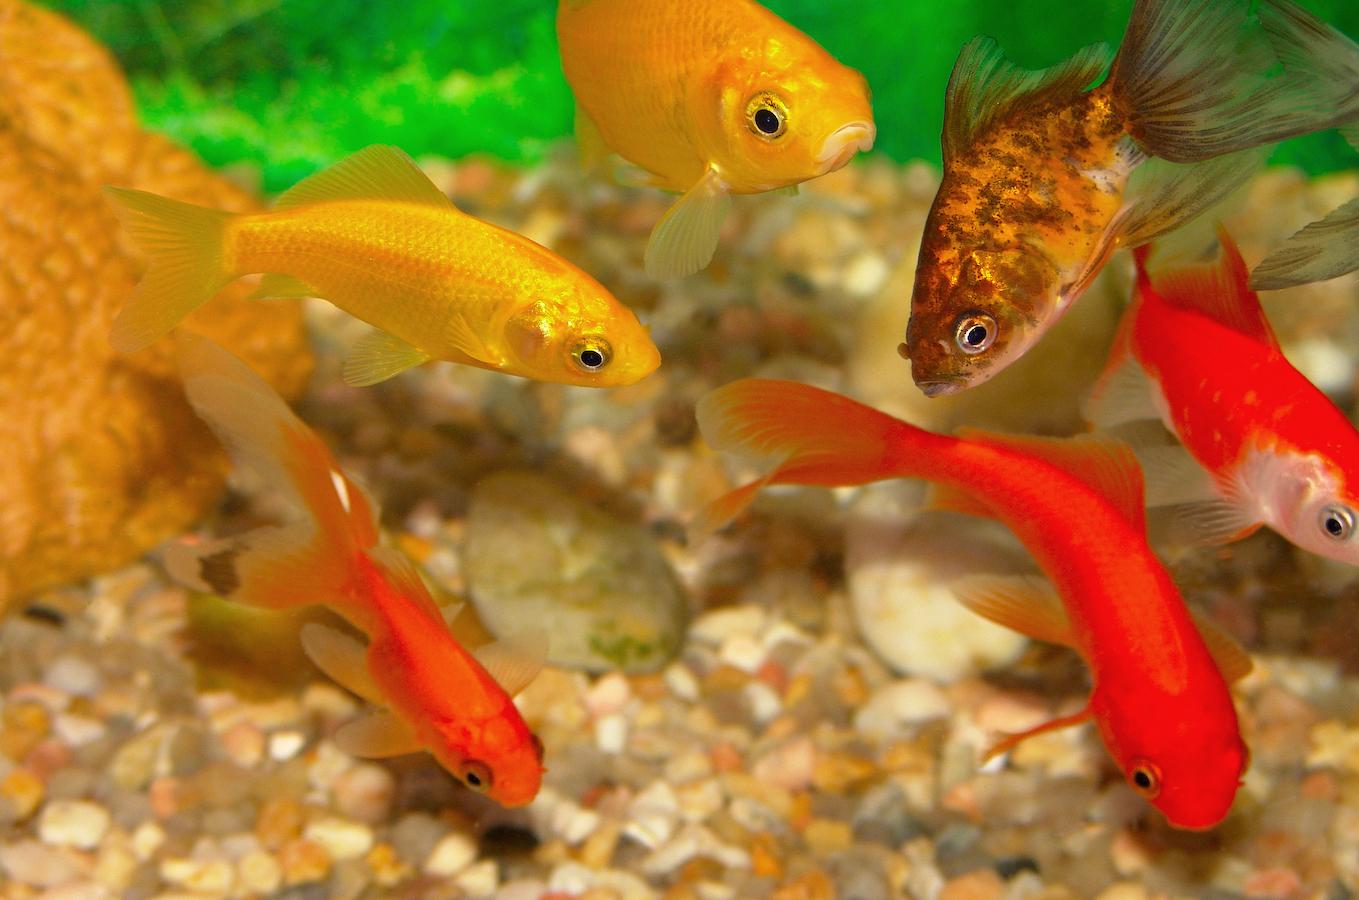 stockvault-golden-fish103952